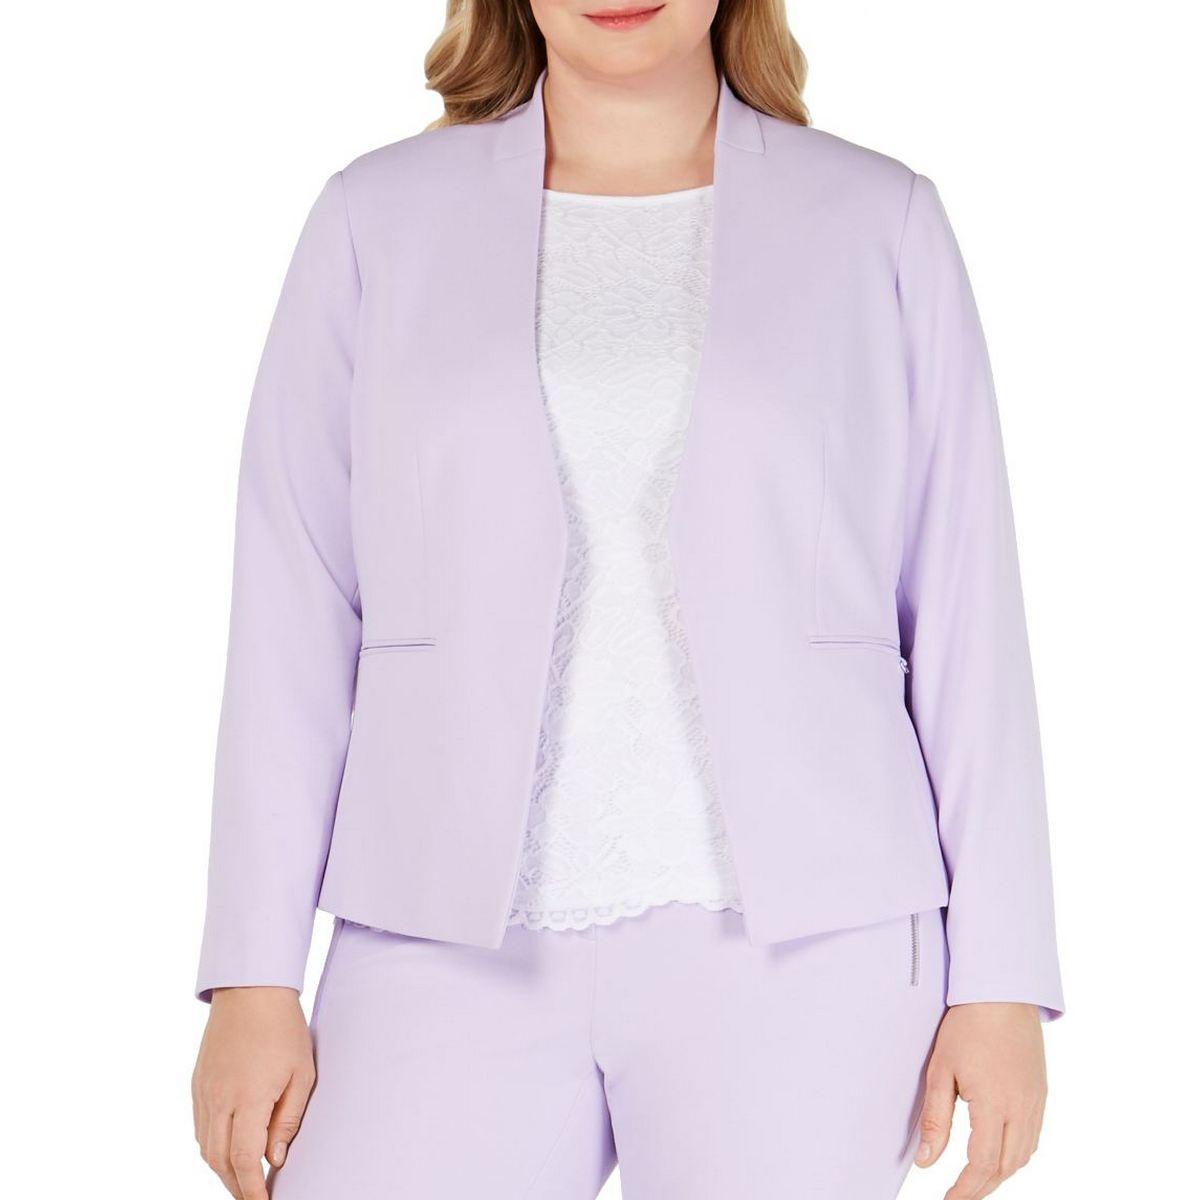 CALVIN KLEIN NEW Women's Plus Size Open-front Lined Blazer Jacket Top 24W TEDO